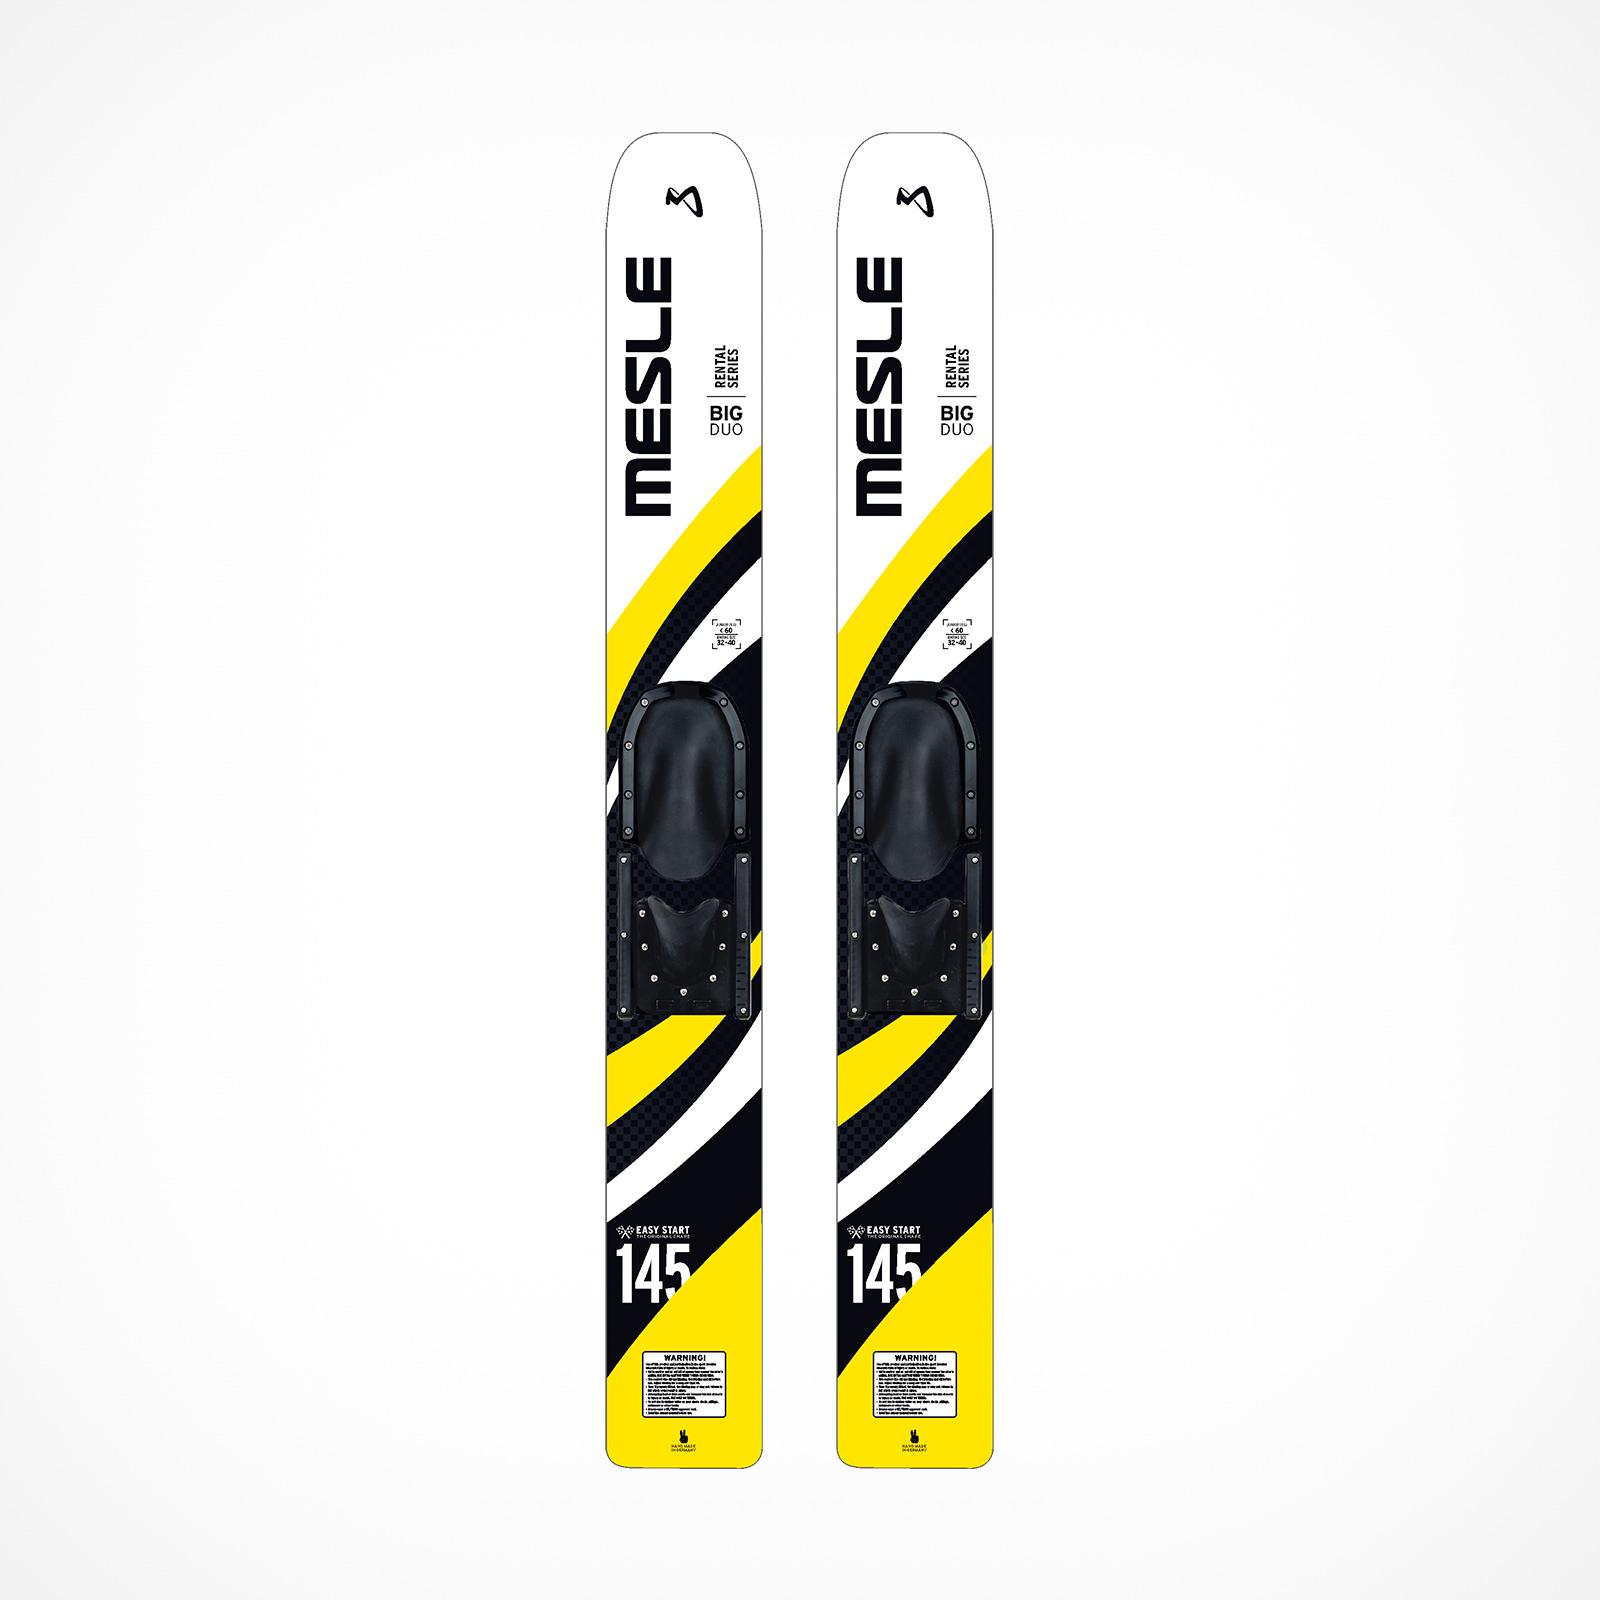 MESLE Big Duo 145cm, yellow, Rentalski for children